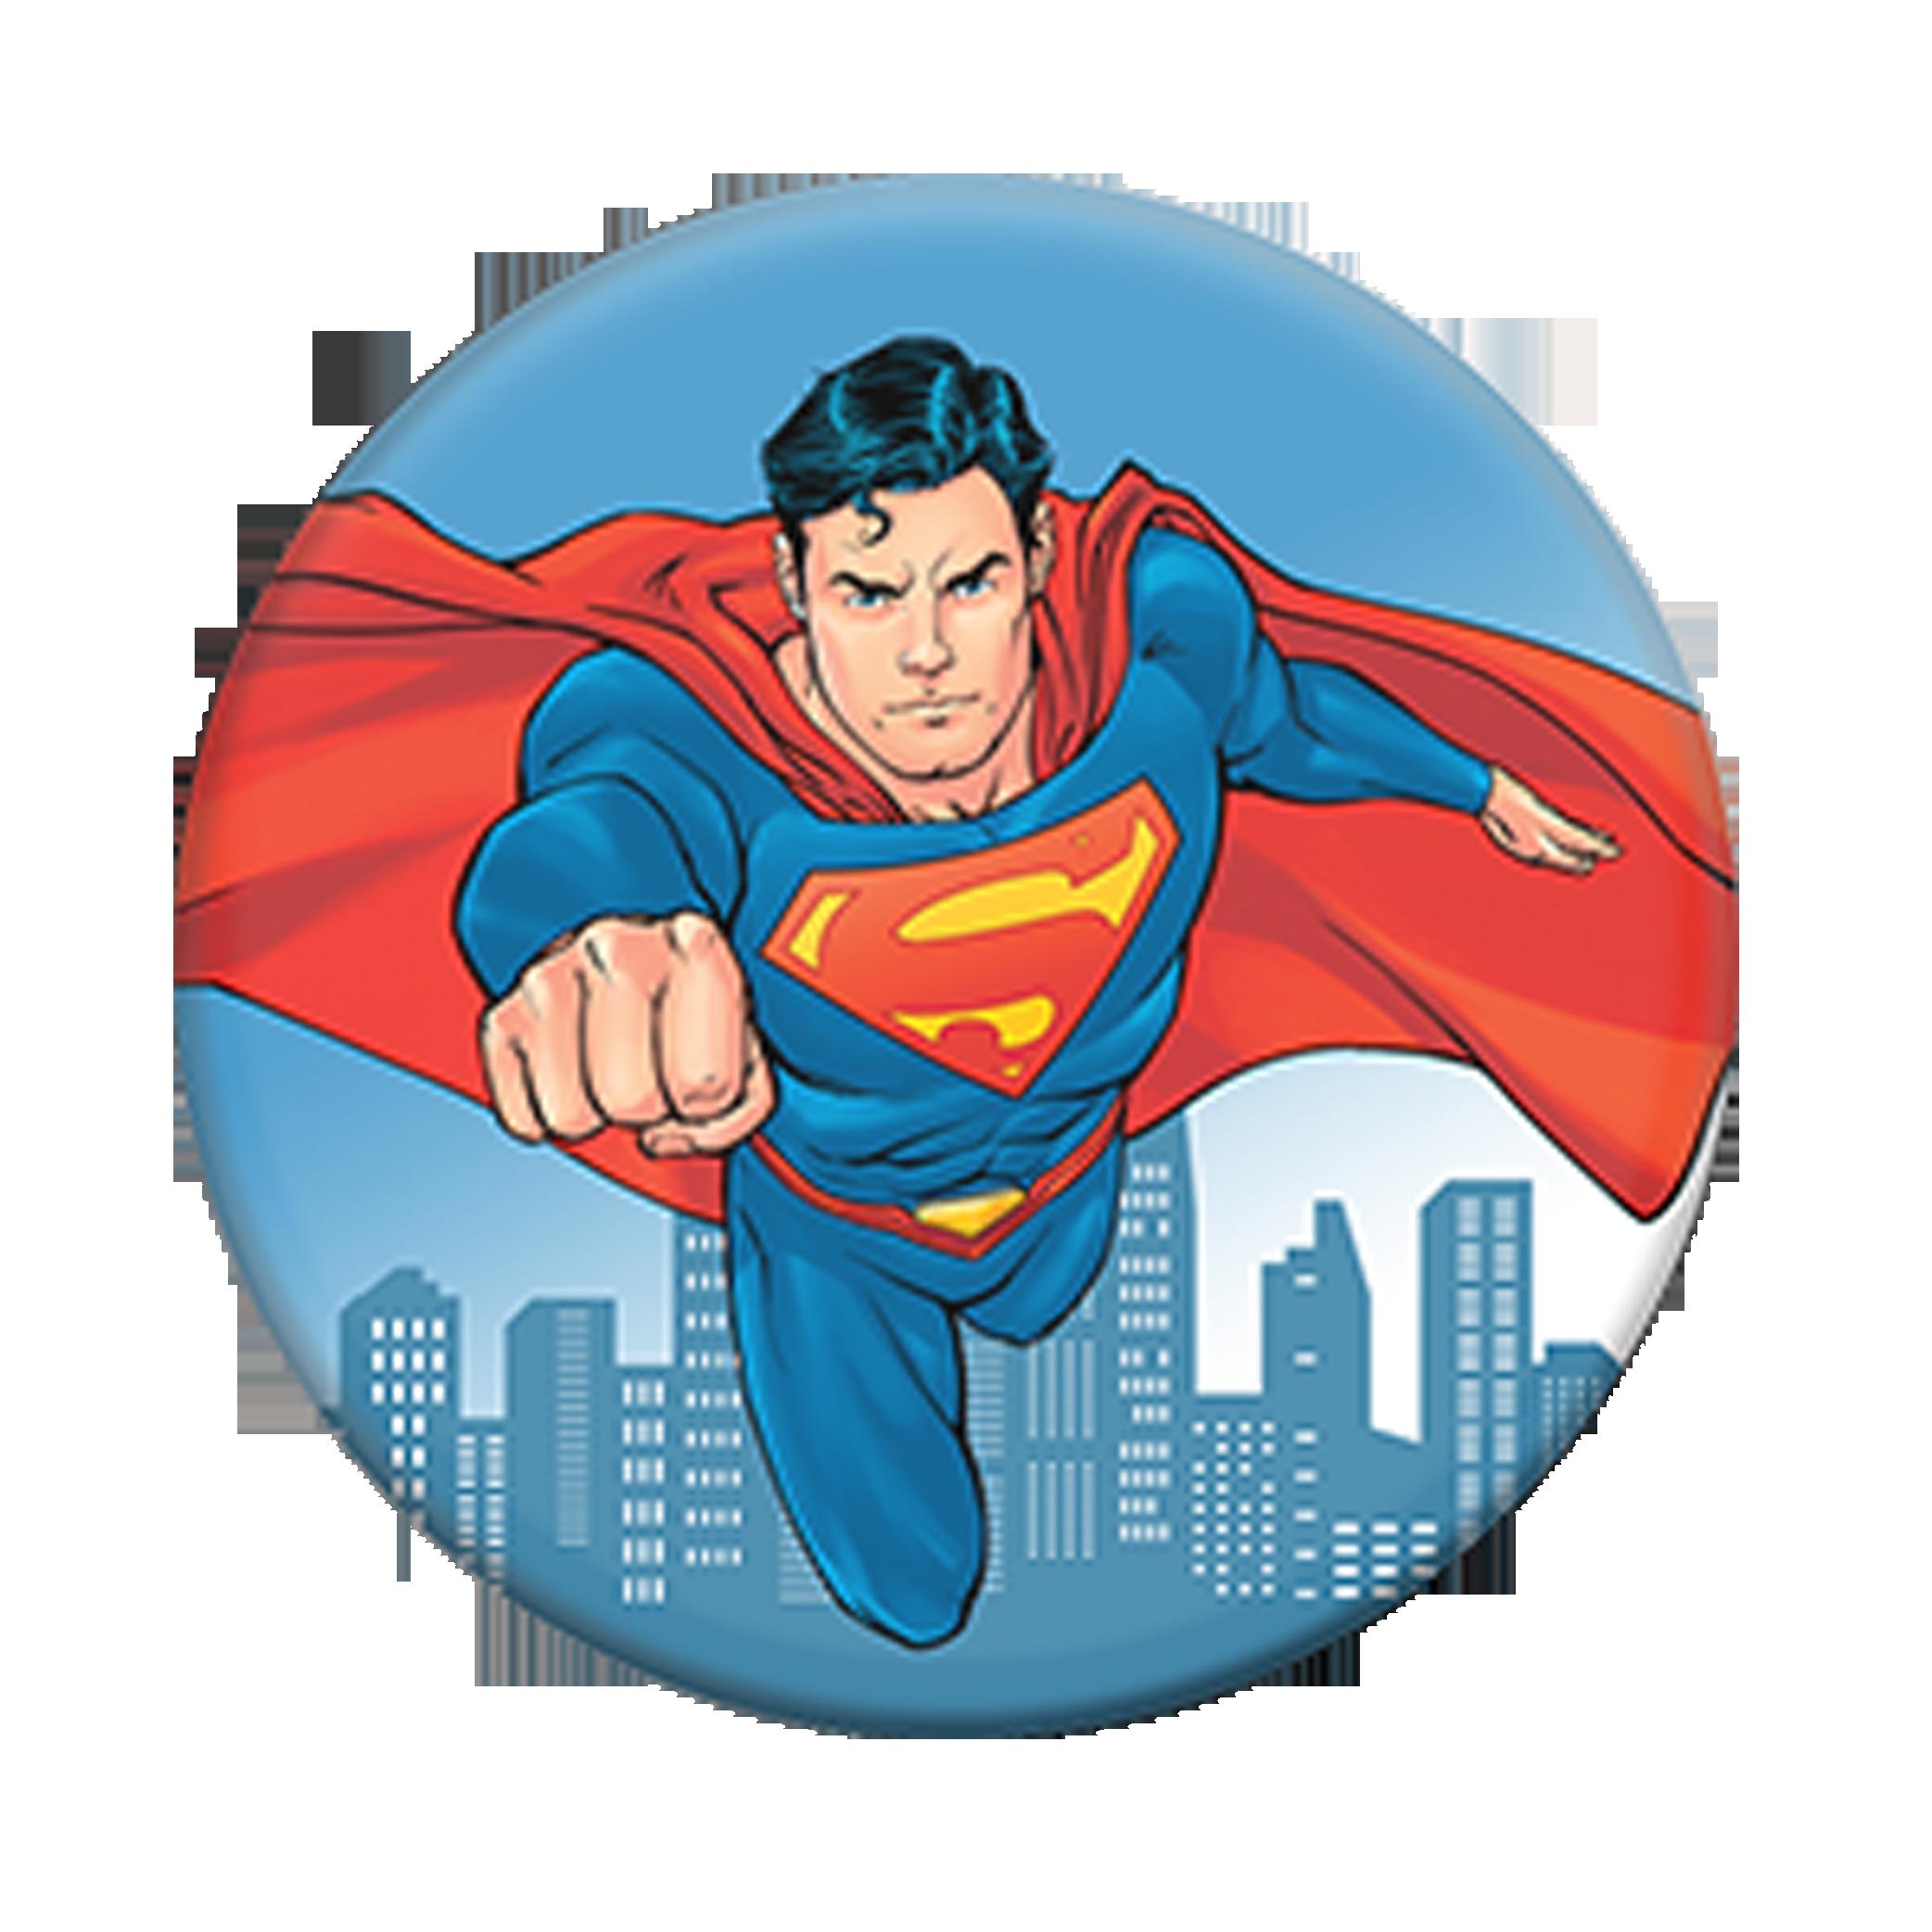 Pin by on PopSocket Original superman, Superman